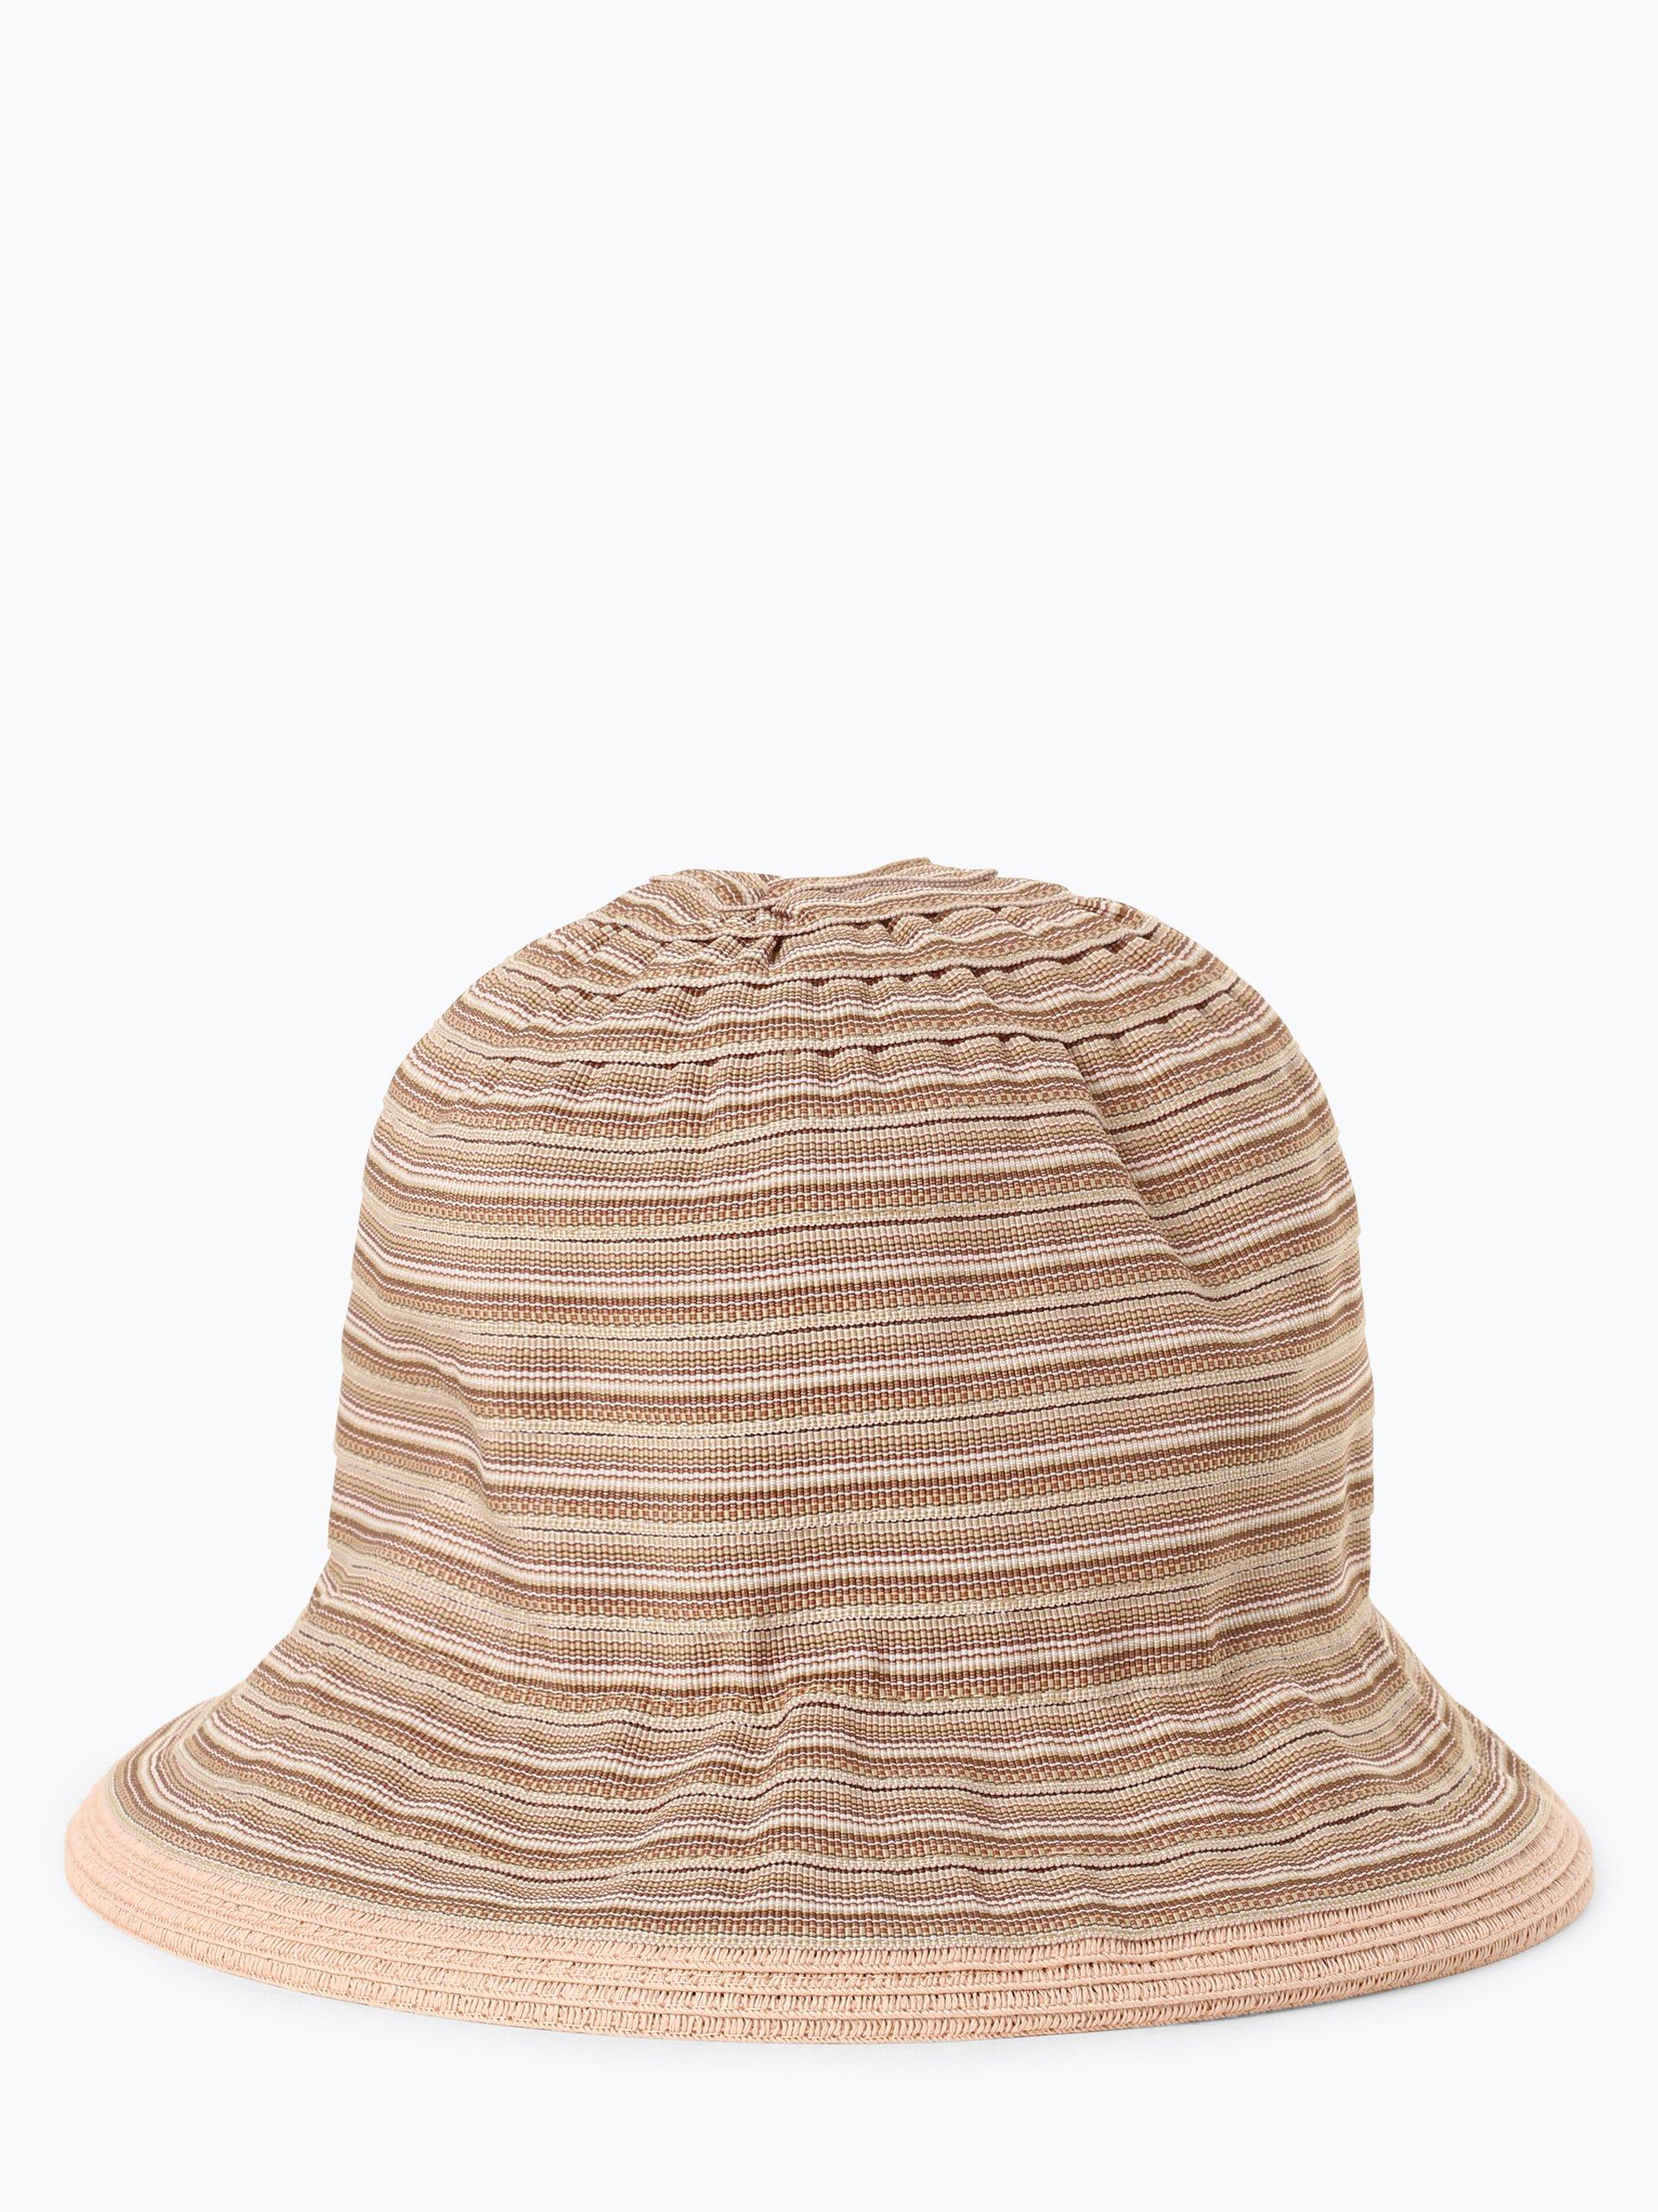 Franco Callegari Damen Hut